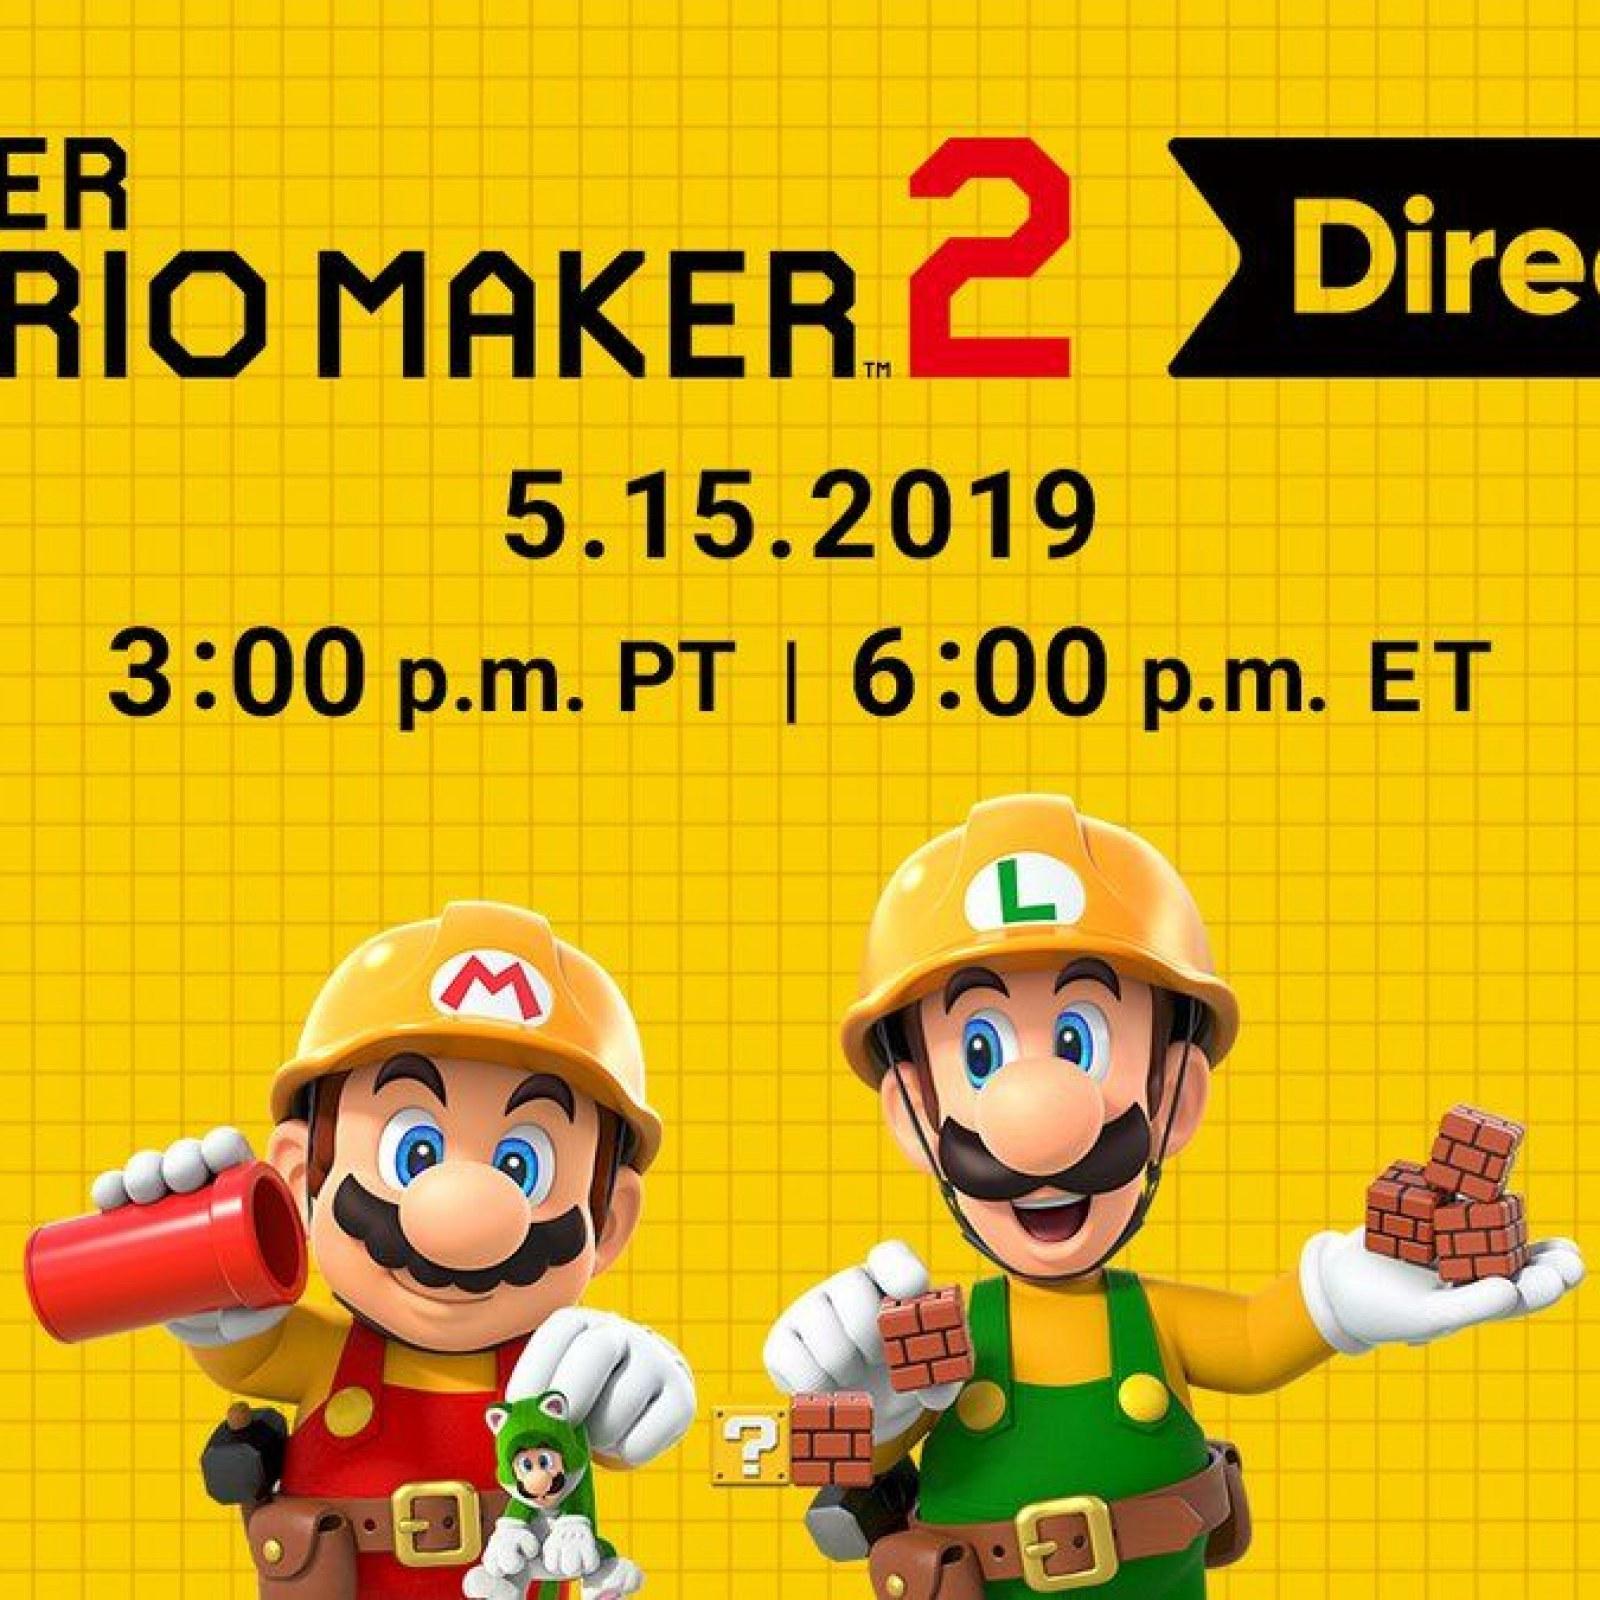 Next Nintendo Direct Will Focus on 'Super Mario Maker 2'